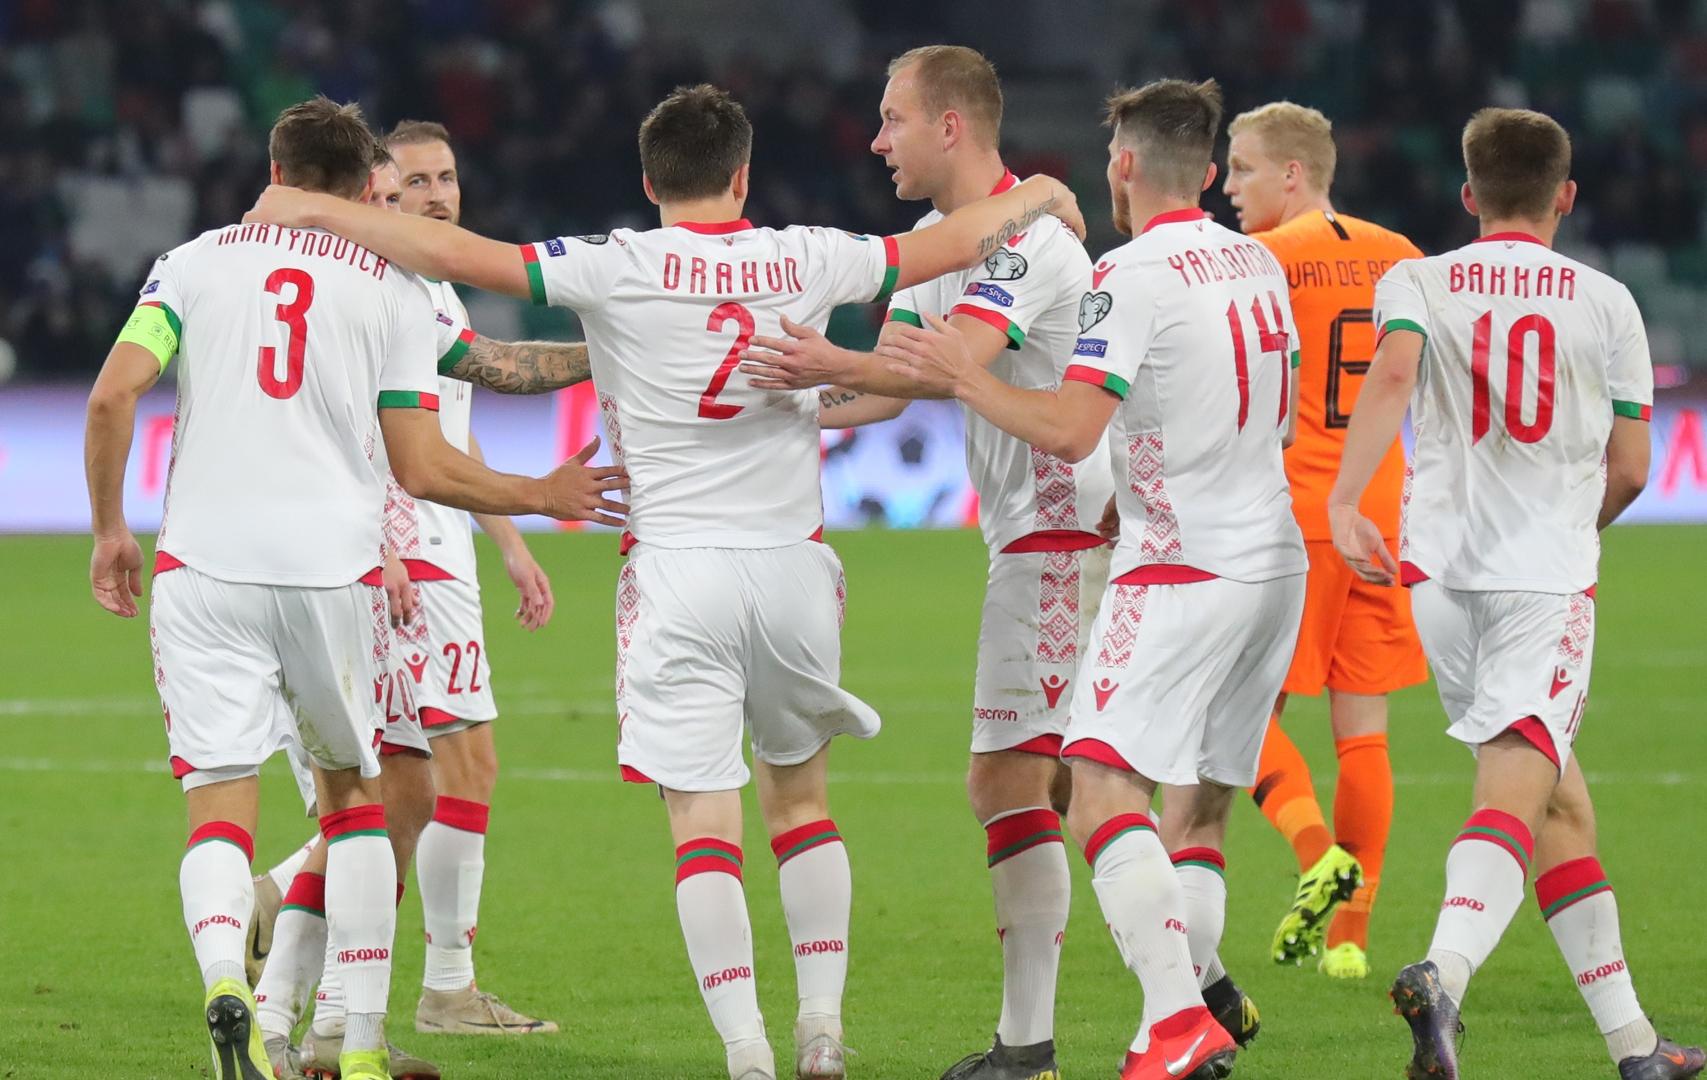 Borussia dortmund vs bayern munich. Buy Belarus Tickets 2020/21   Football Ticket Net